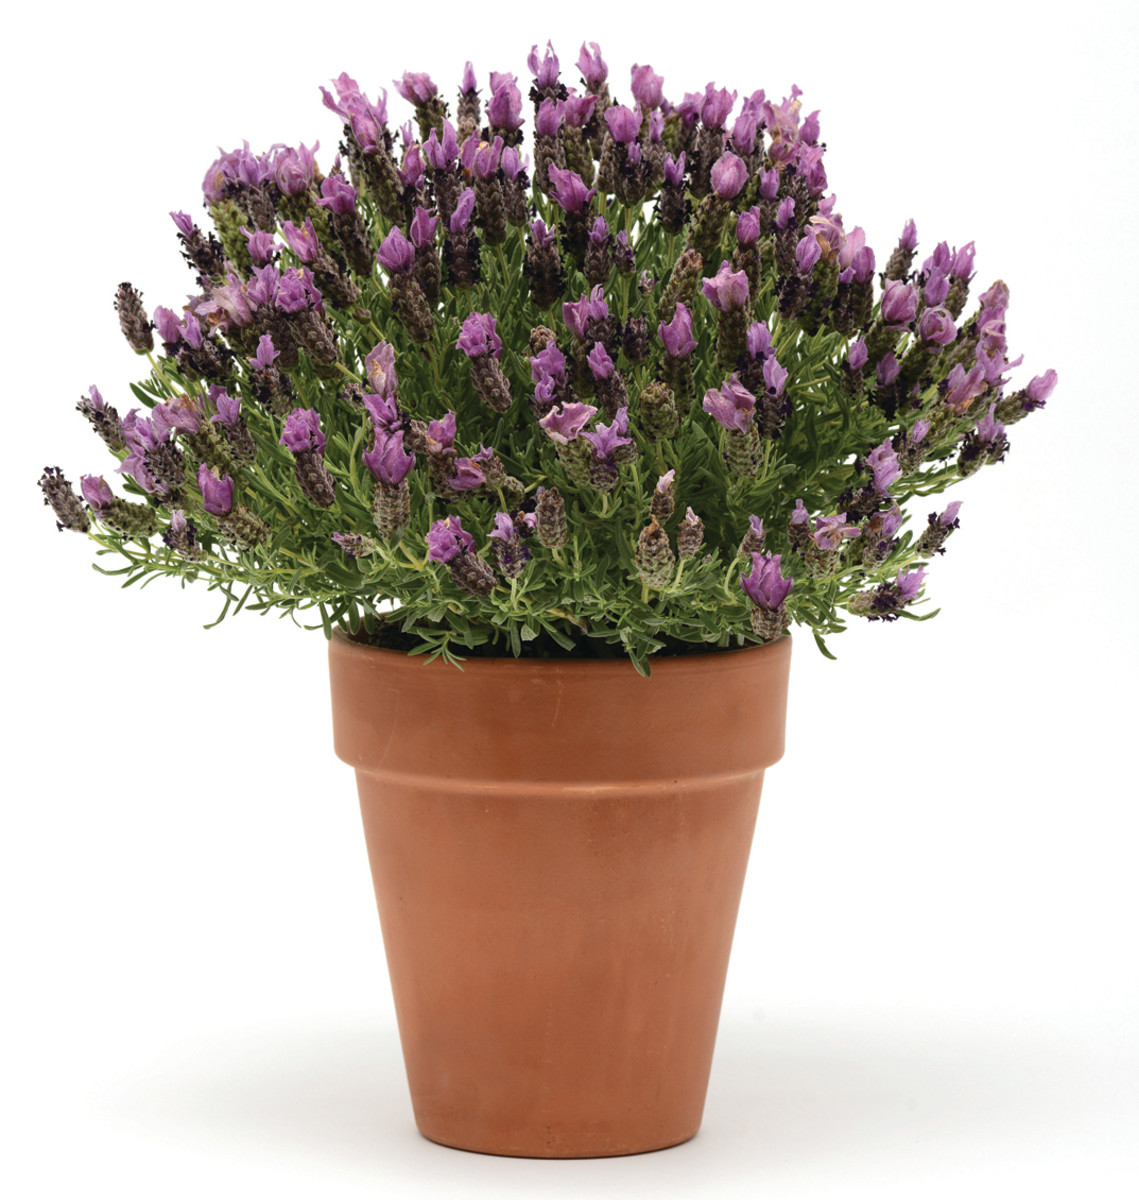 'Bandera Purple' Spanish Lavender